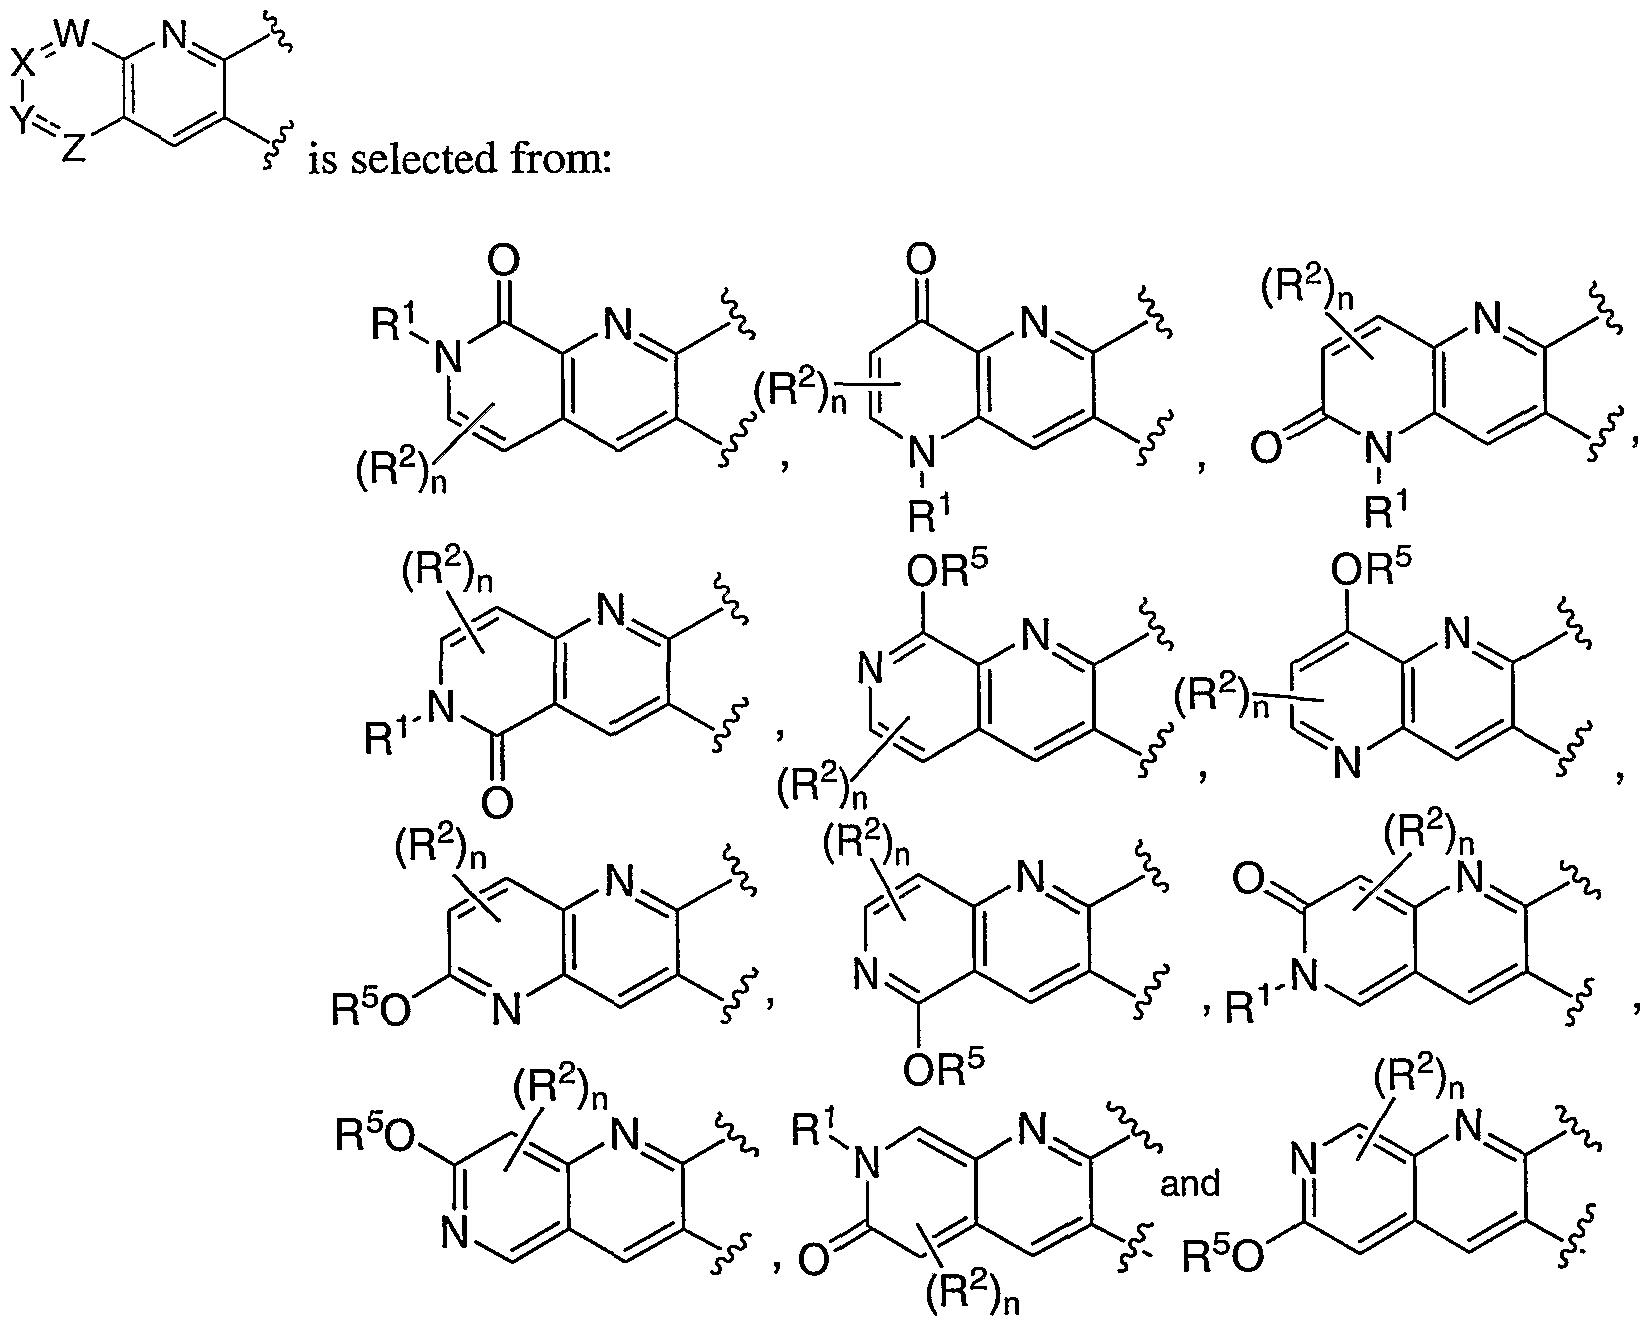 ep1827436a2 - inhibitors of akt activity